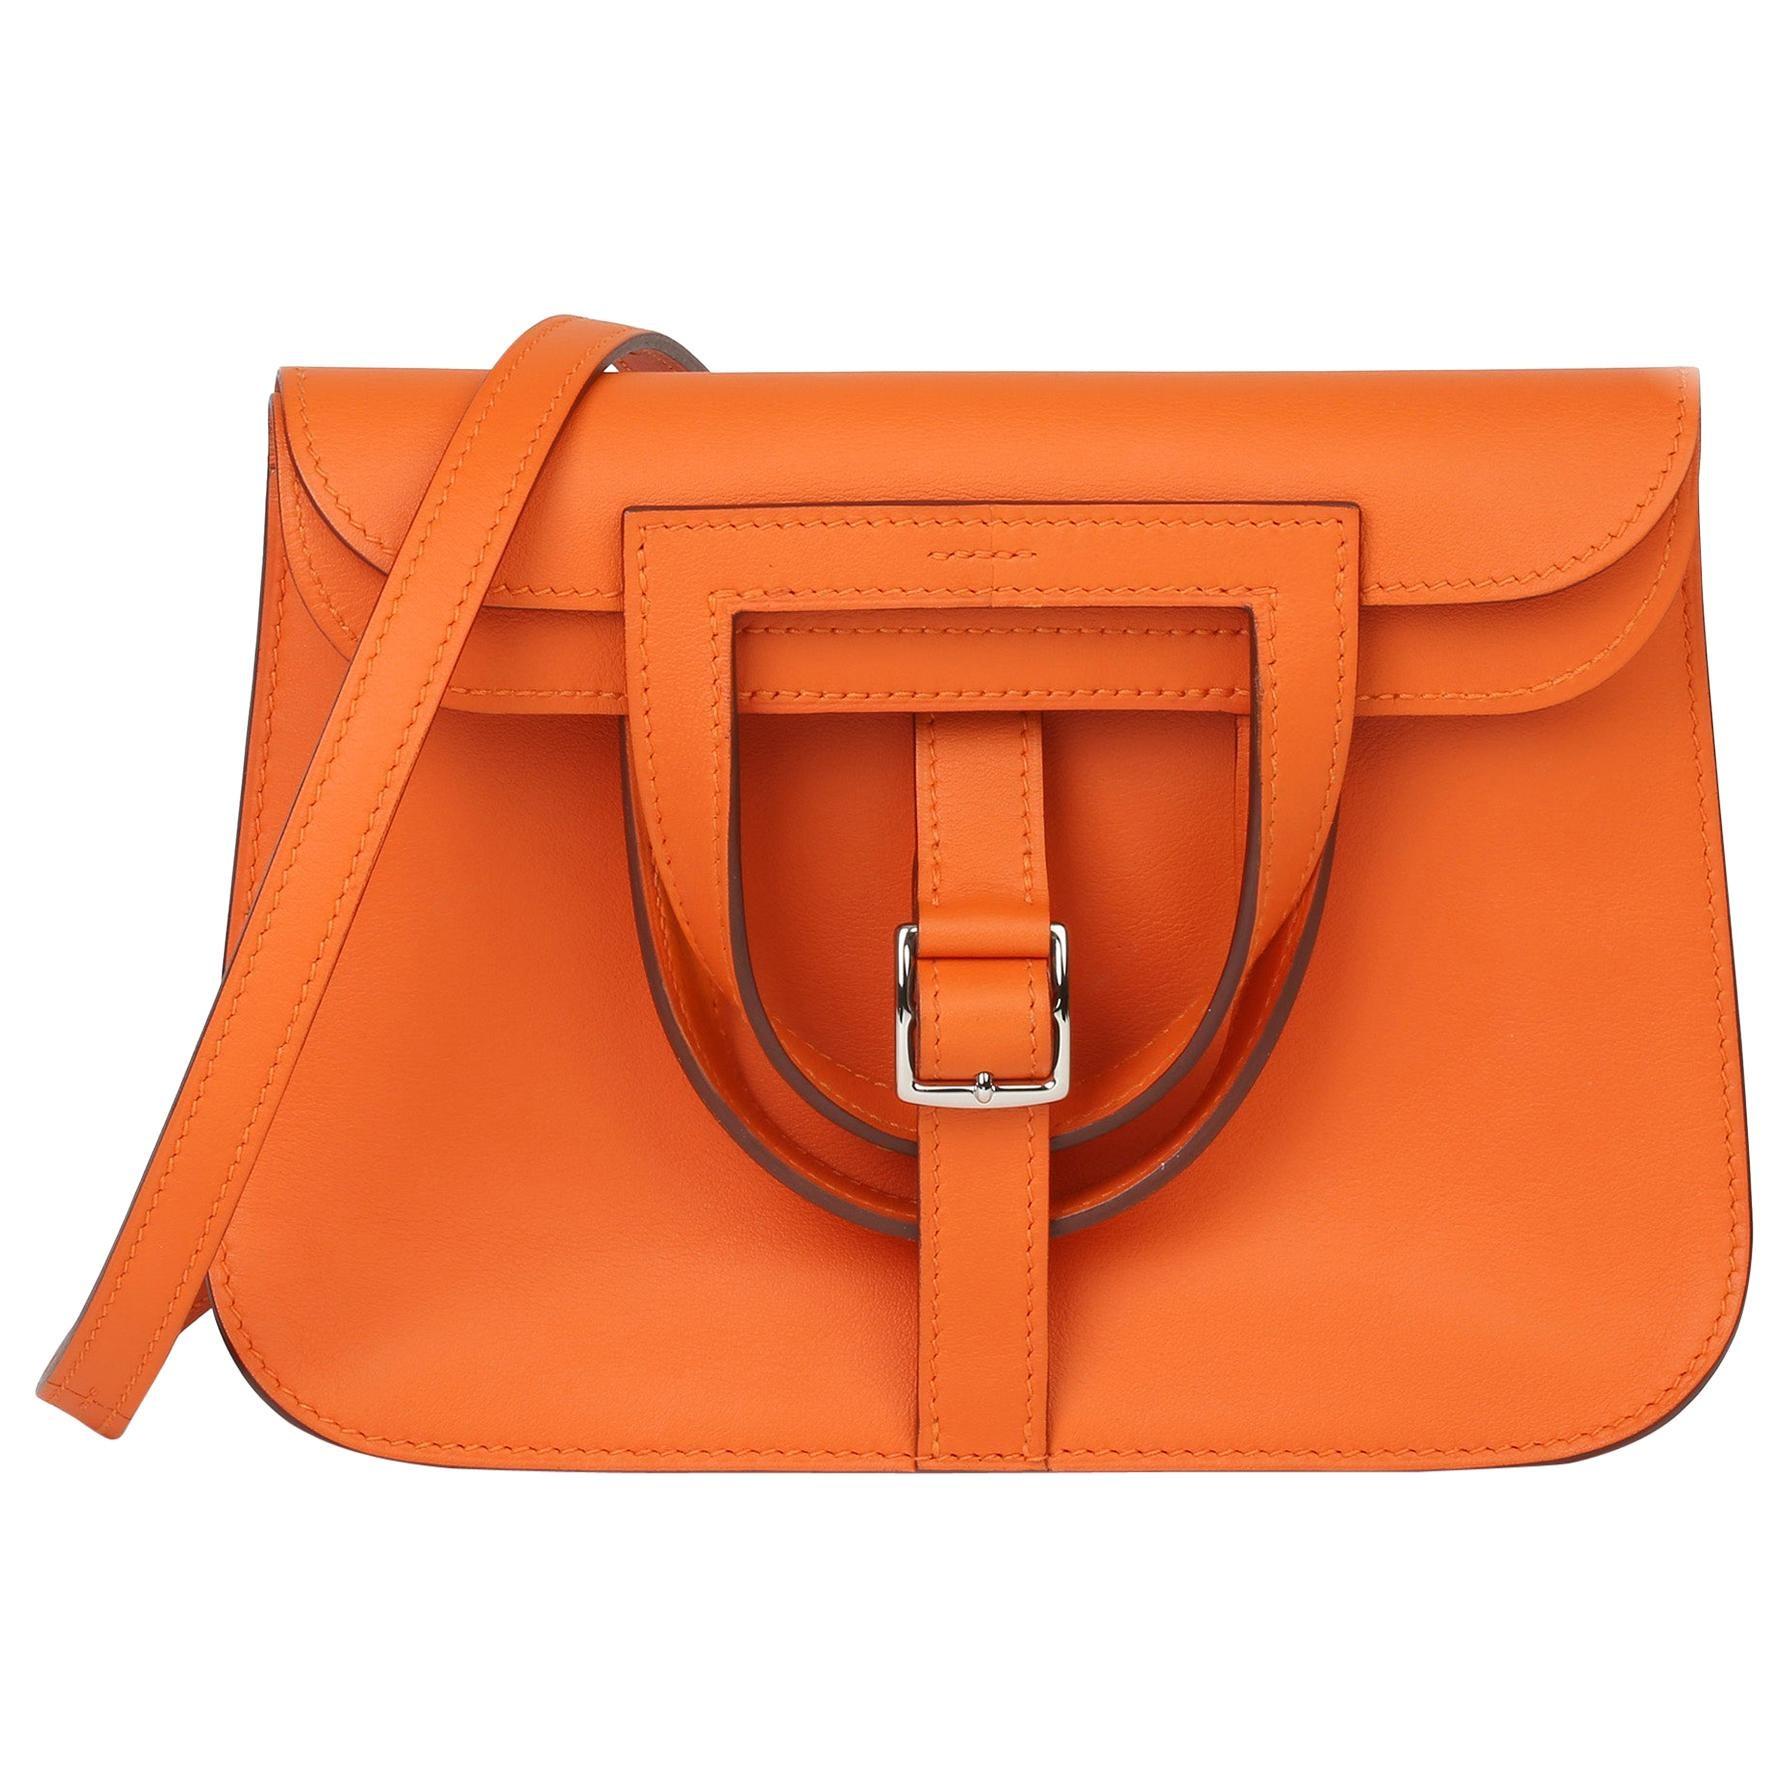 2016 Hermes Orange H Swift Leather Halzan 22